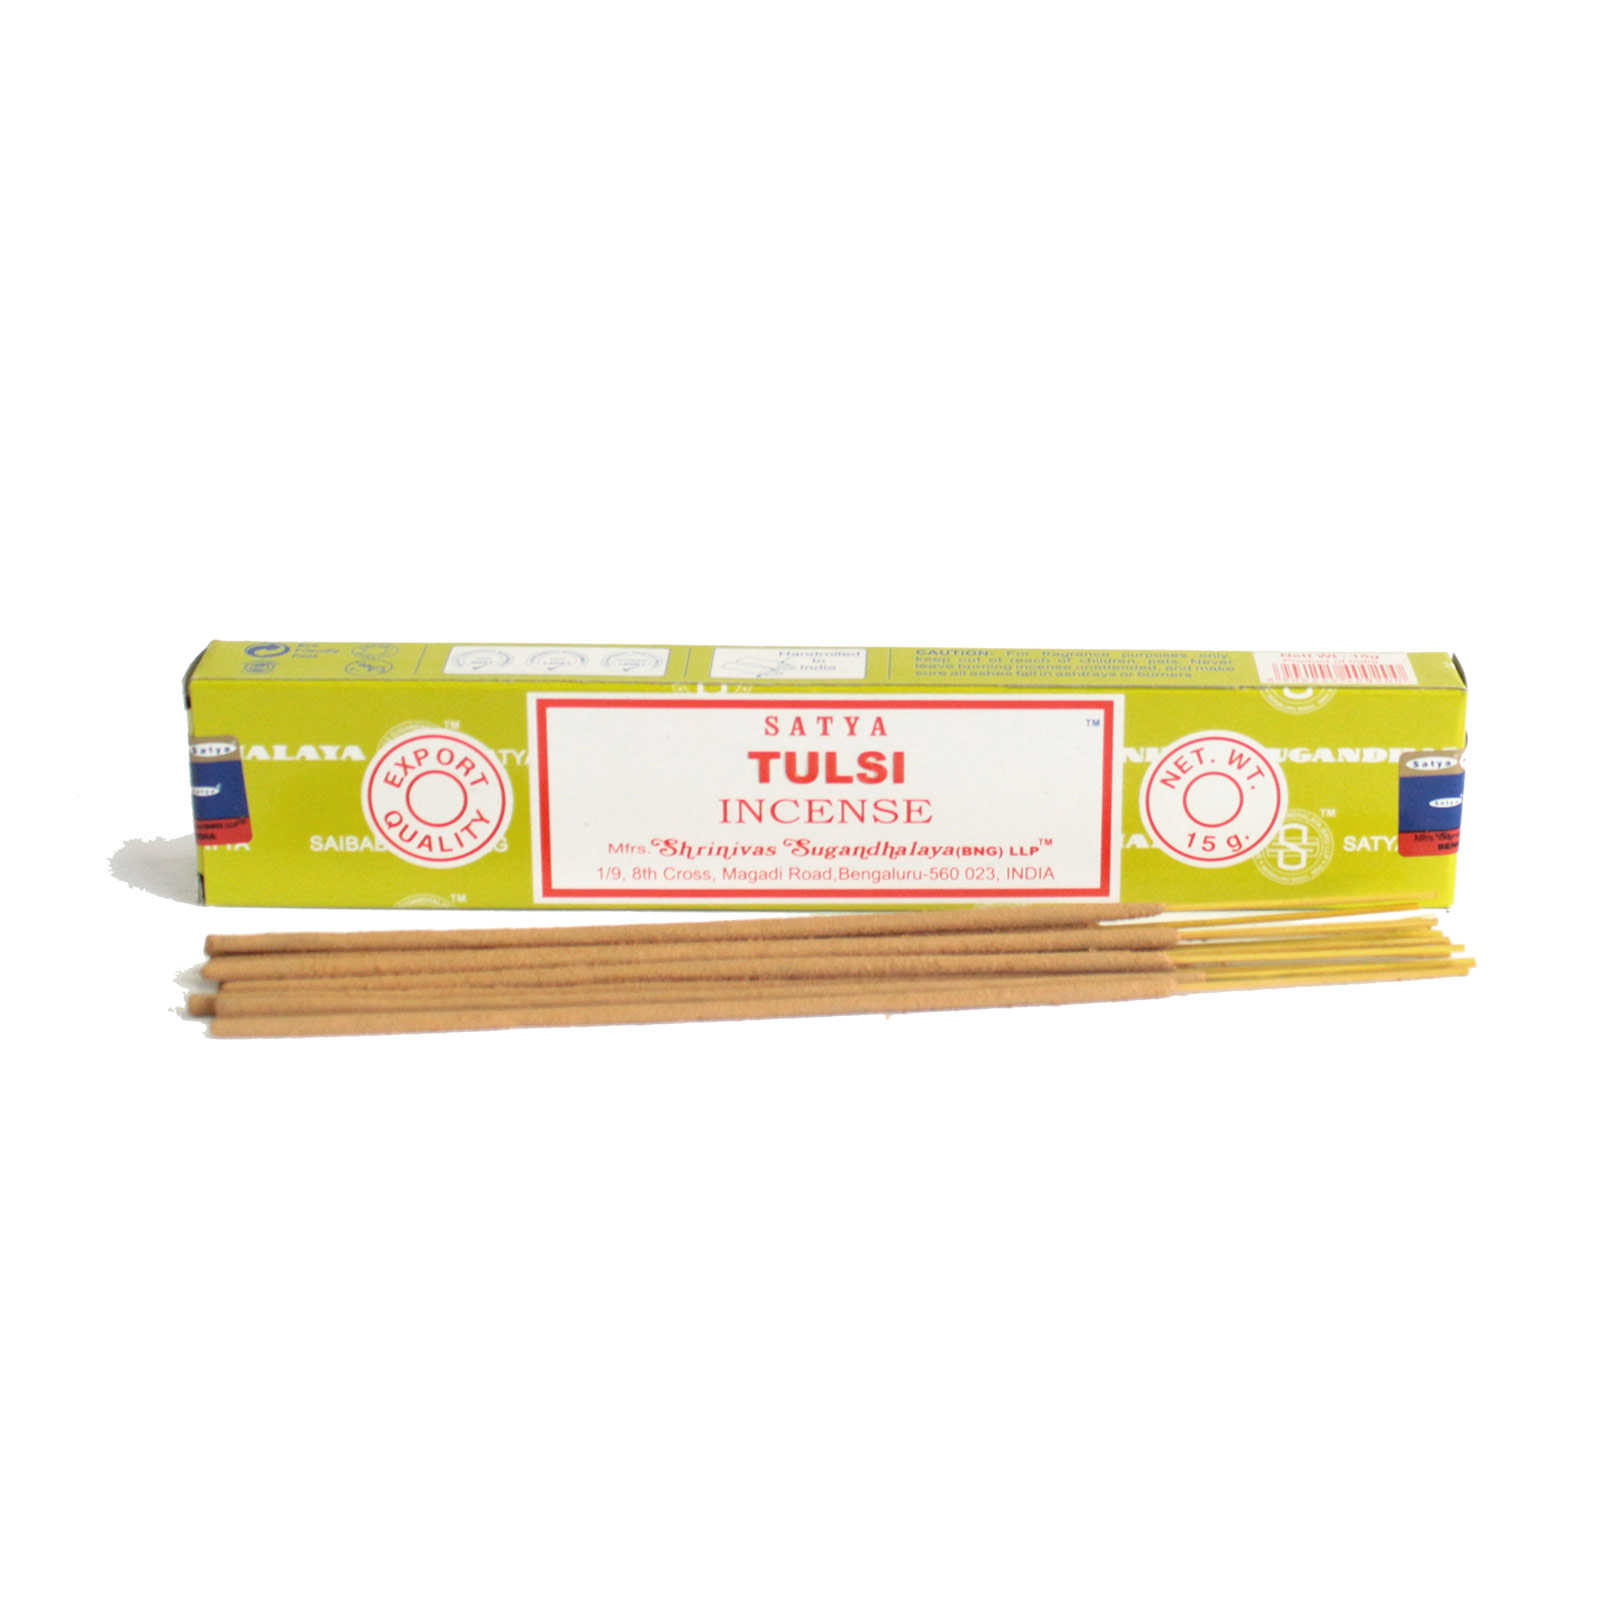 Satya Tulsi - 15 gram